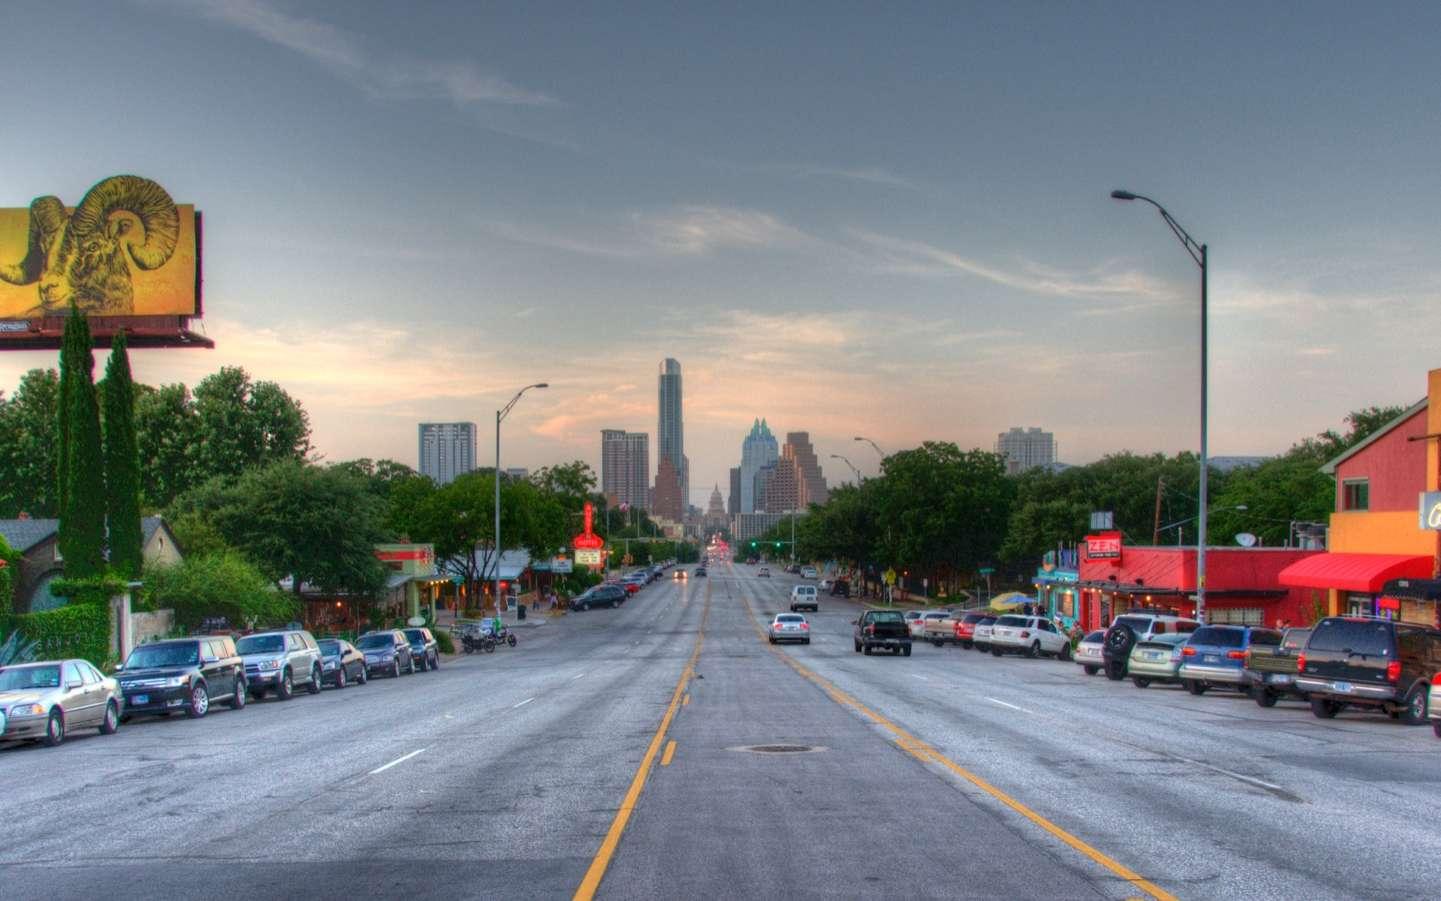 La South Congress Avenue traversant le quartier de South Congress. © Justin Jensen, Wikimedia Commons, CC by-sa 2.0